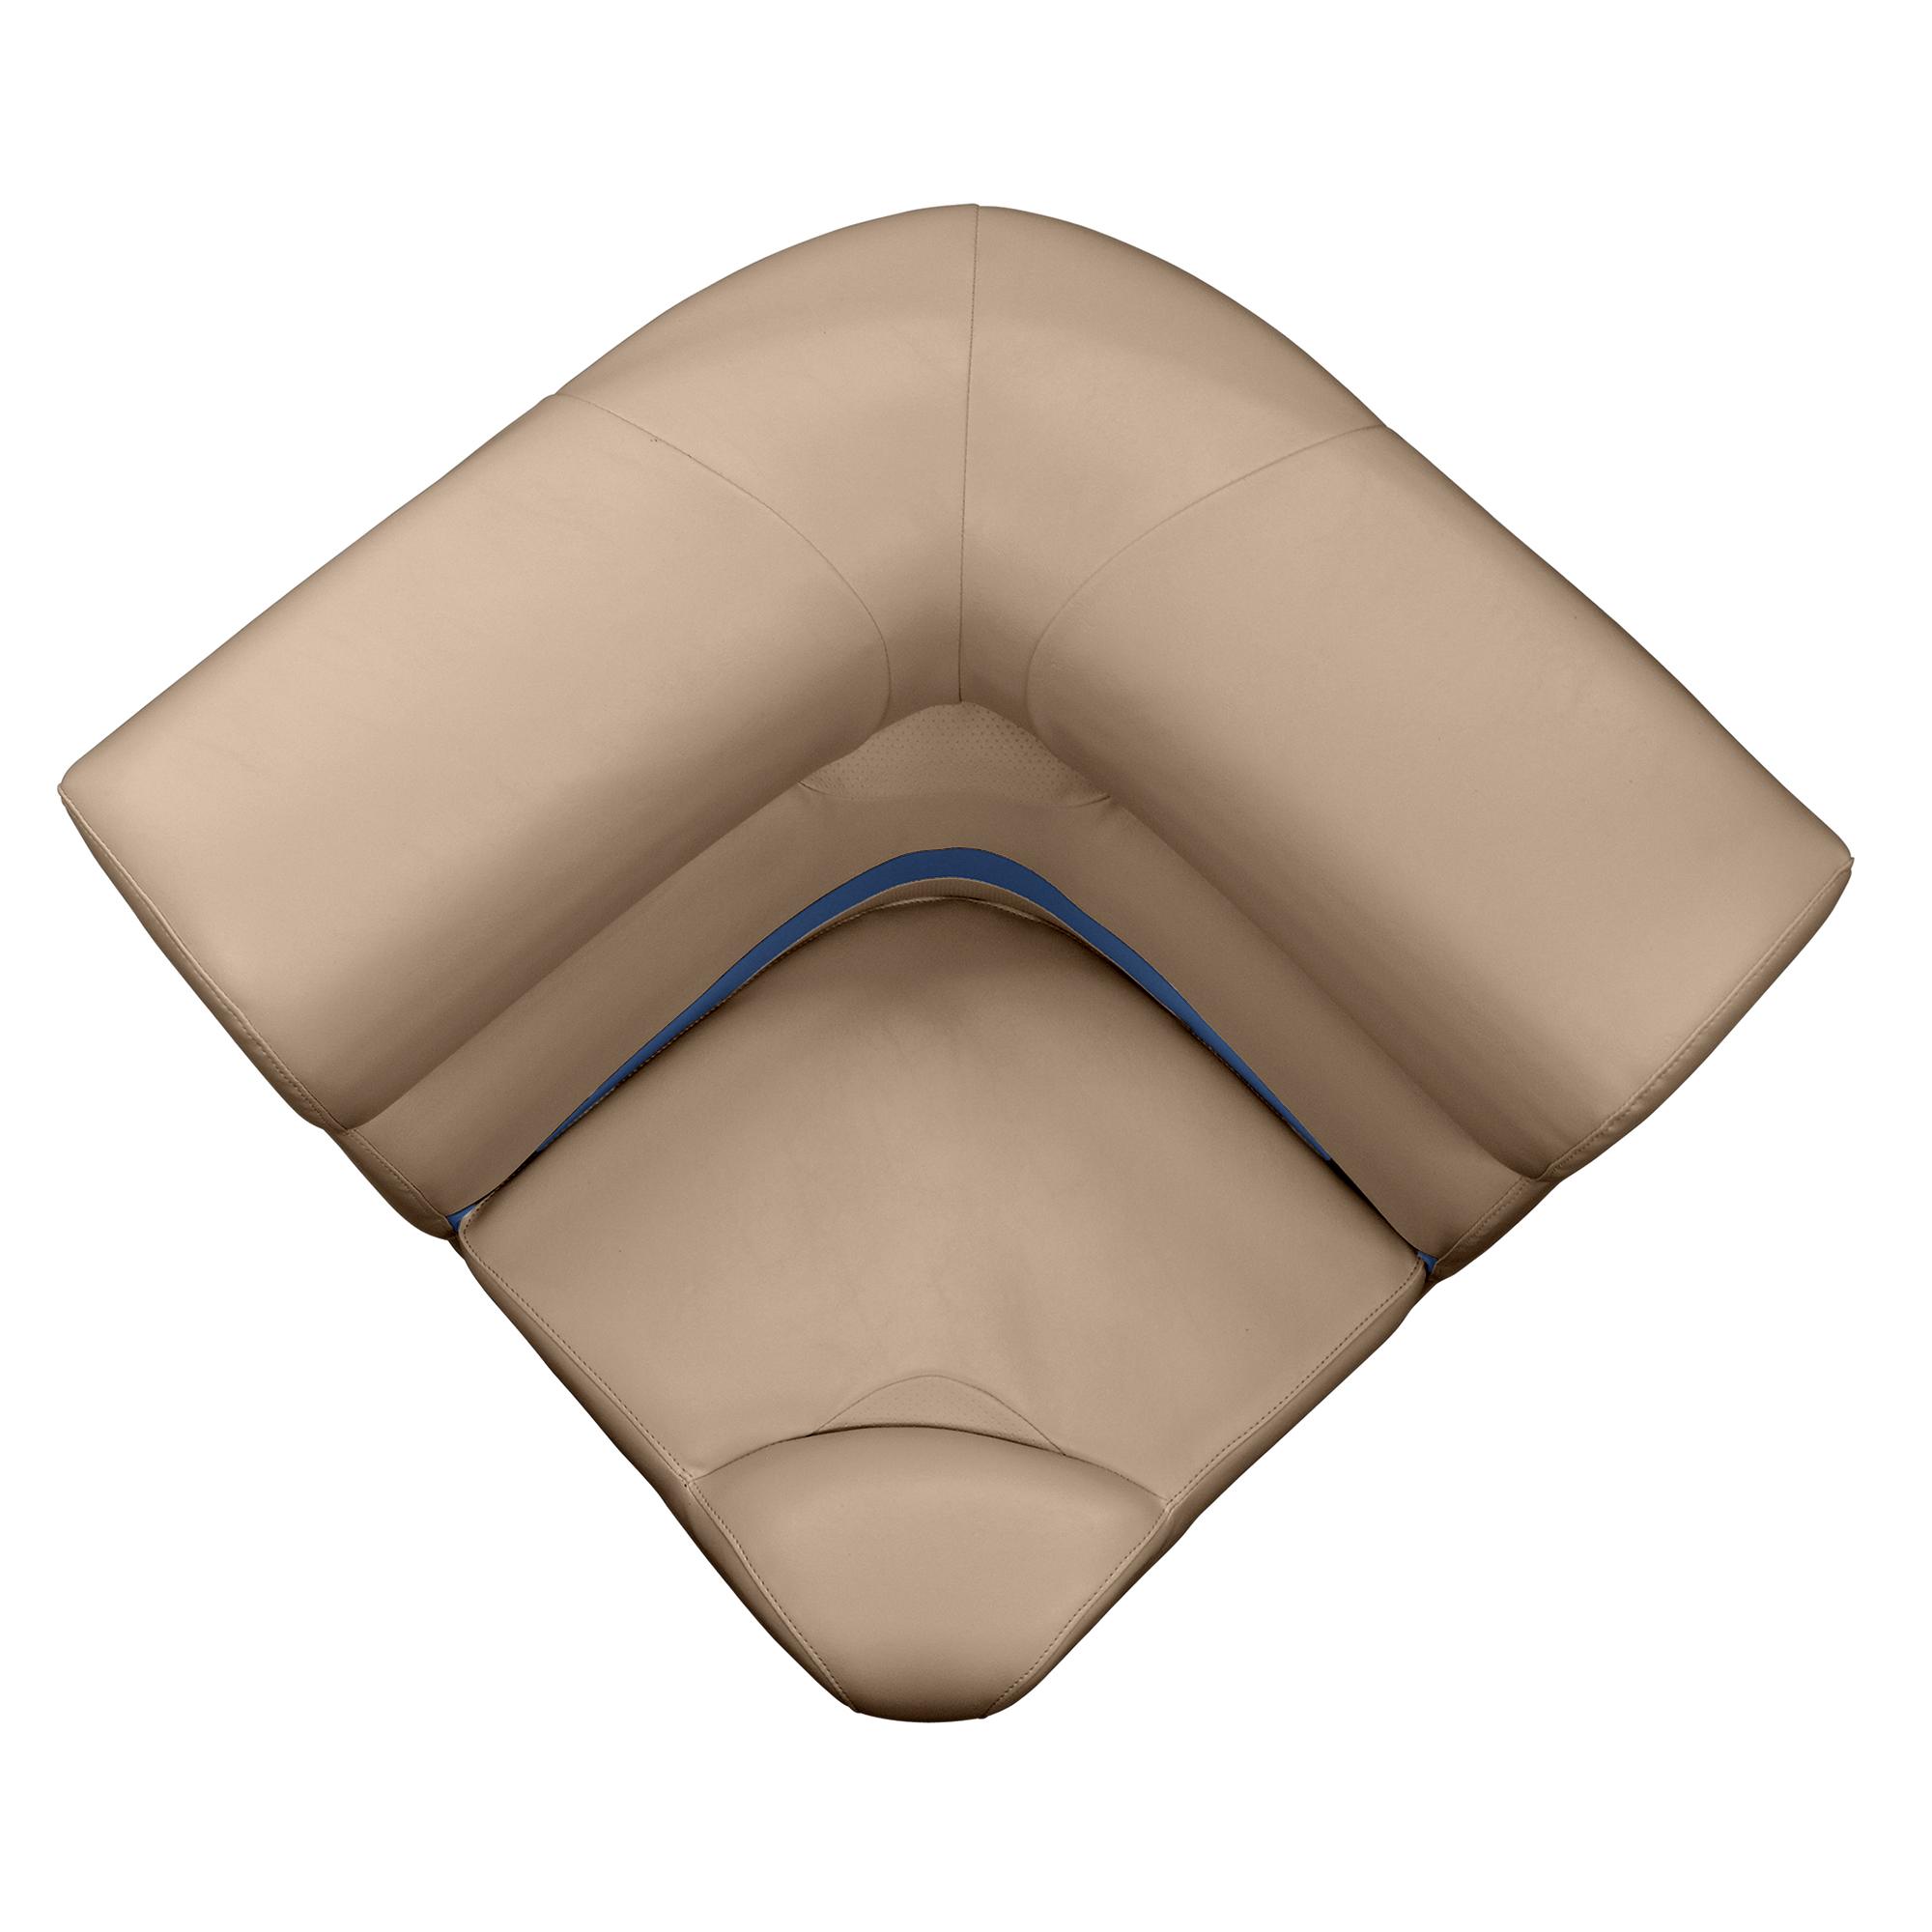 "Toonmate 25"" Premium Pontoon Corner Section Seat w/Rounded Corner, Mocha Base"